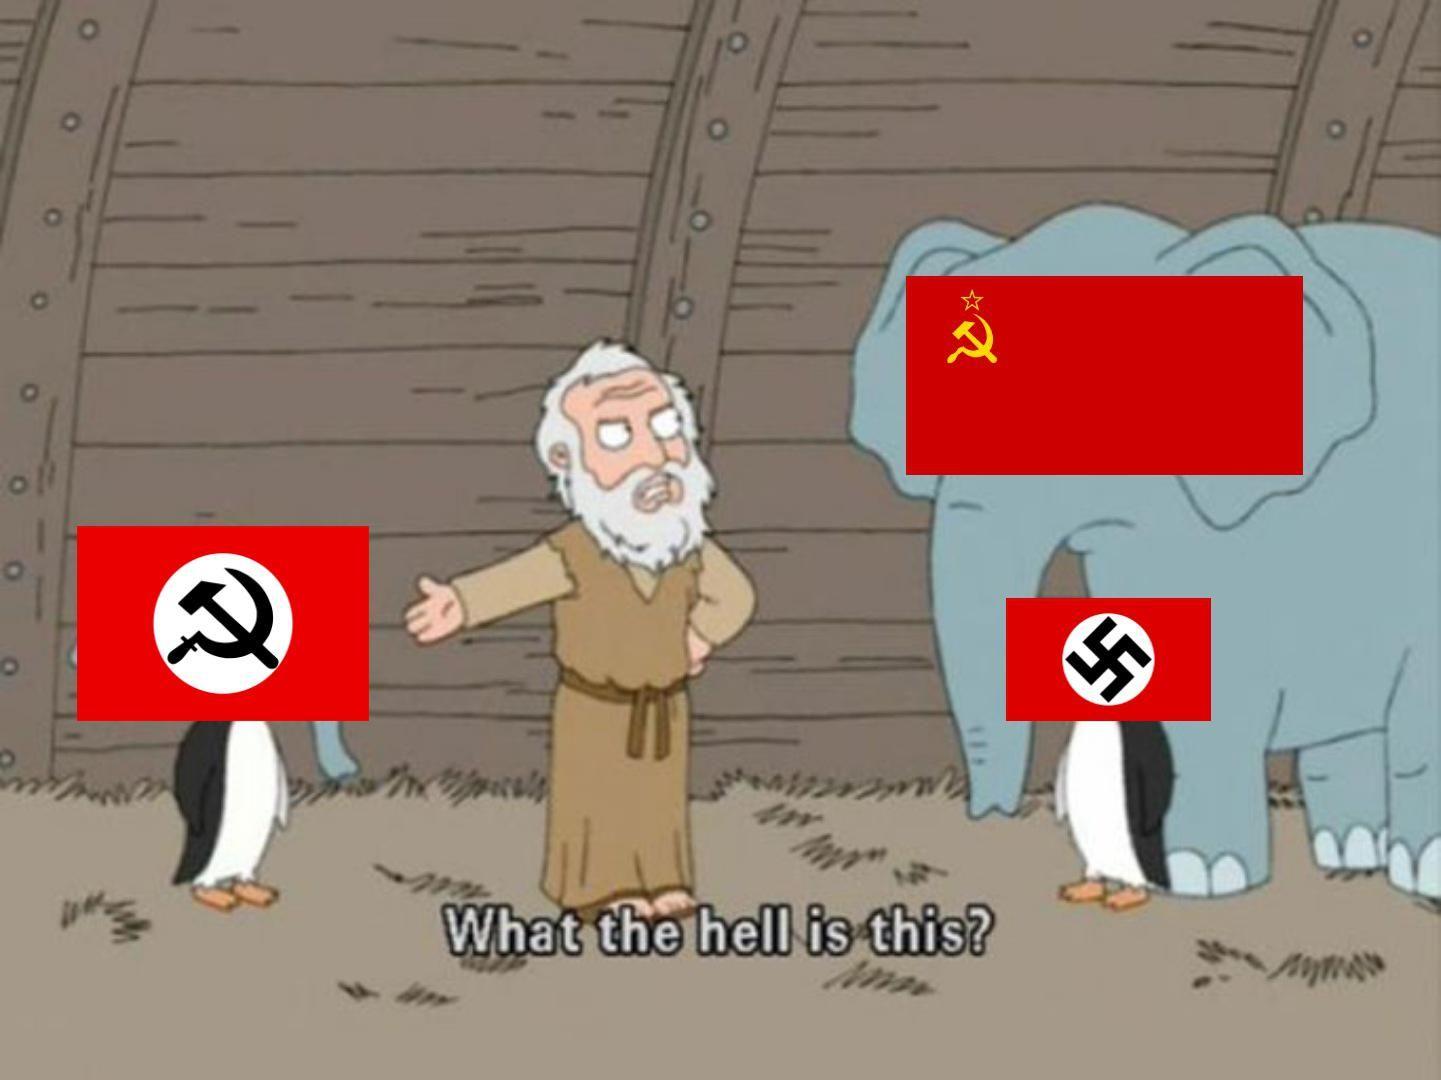 Post-Soviet Russian politics were kinda crazy